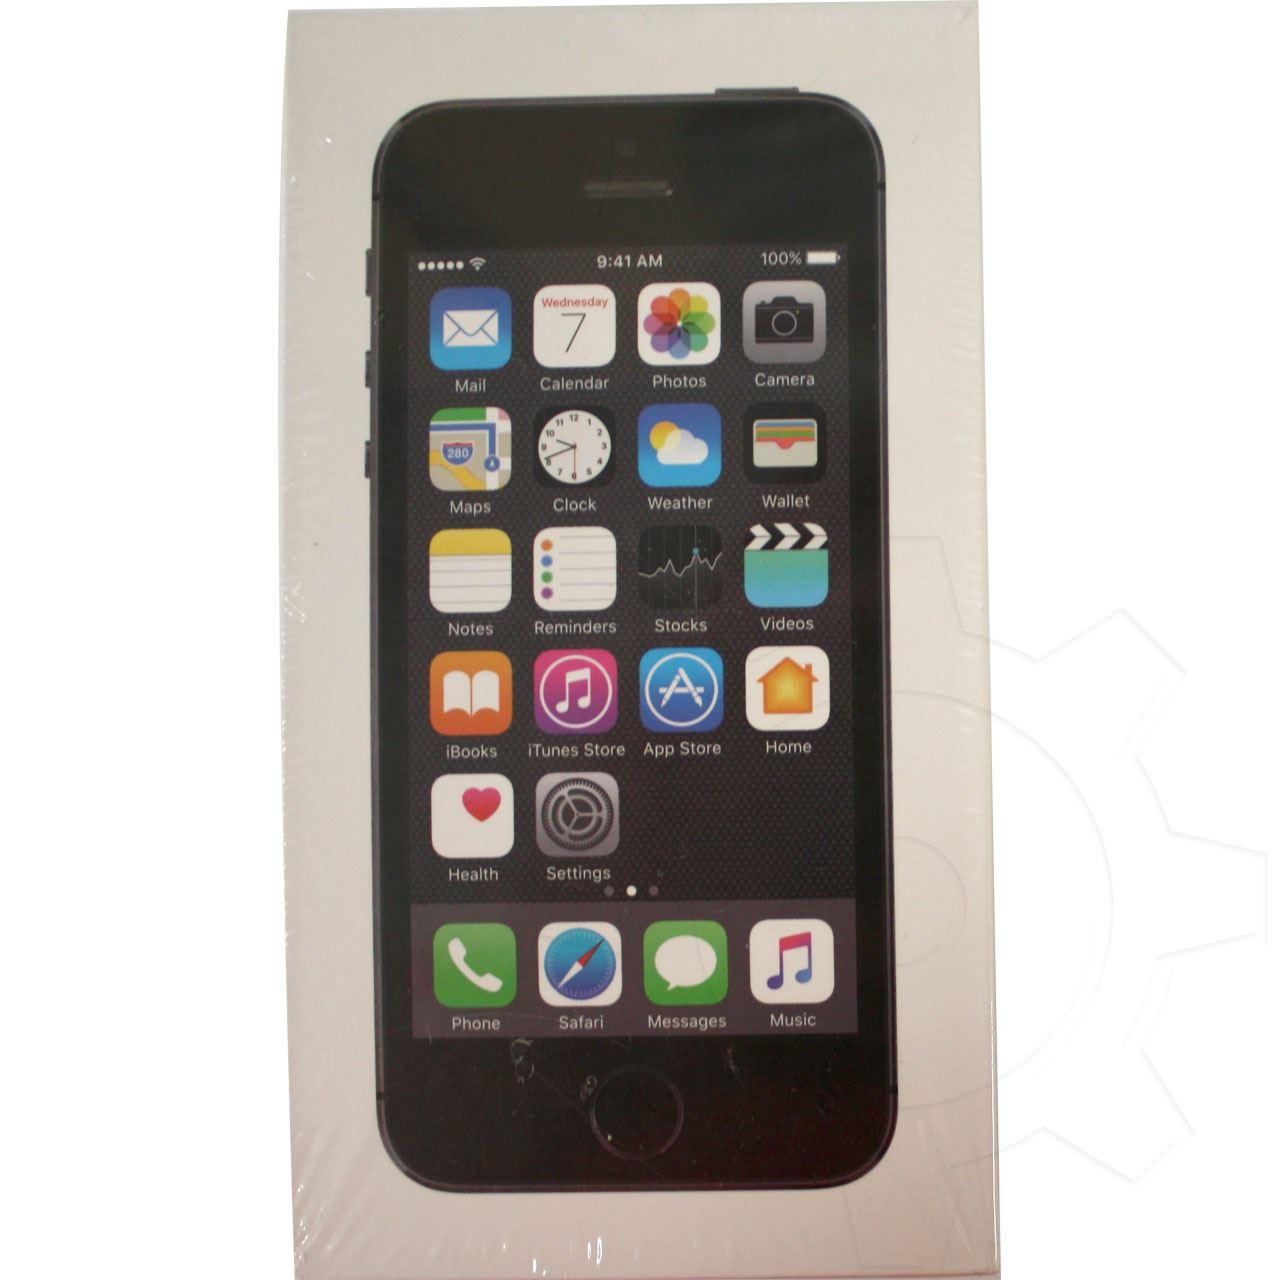 apple iphone 5s 16 gb grau smartphones ohne vertrag. Black Bedroom Furniture Sets. Home Design Ideas